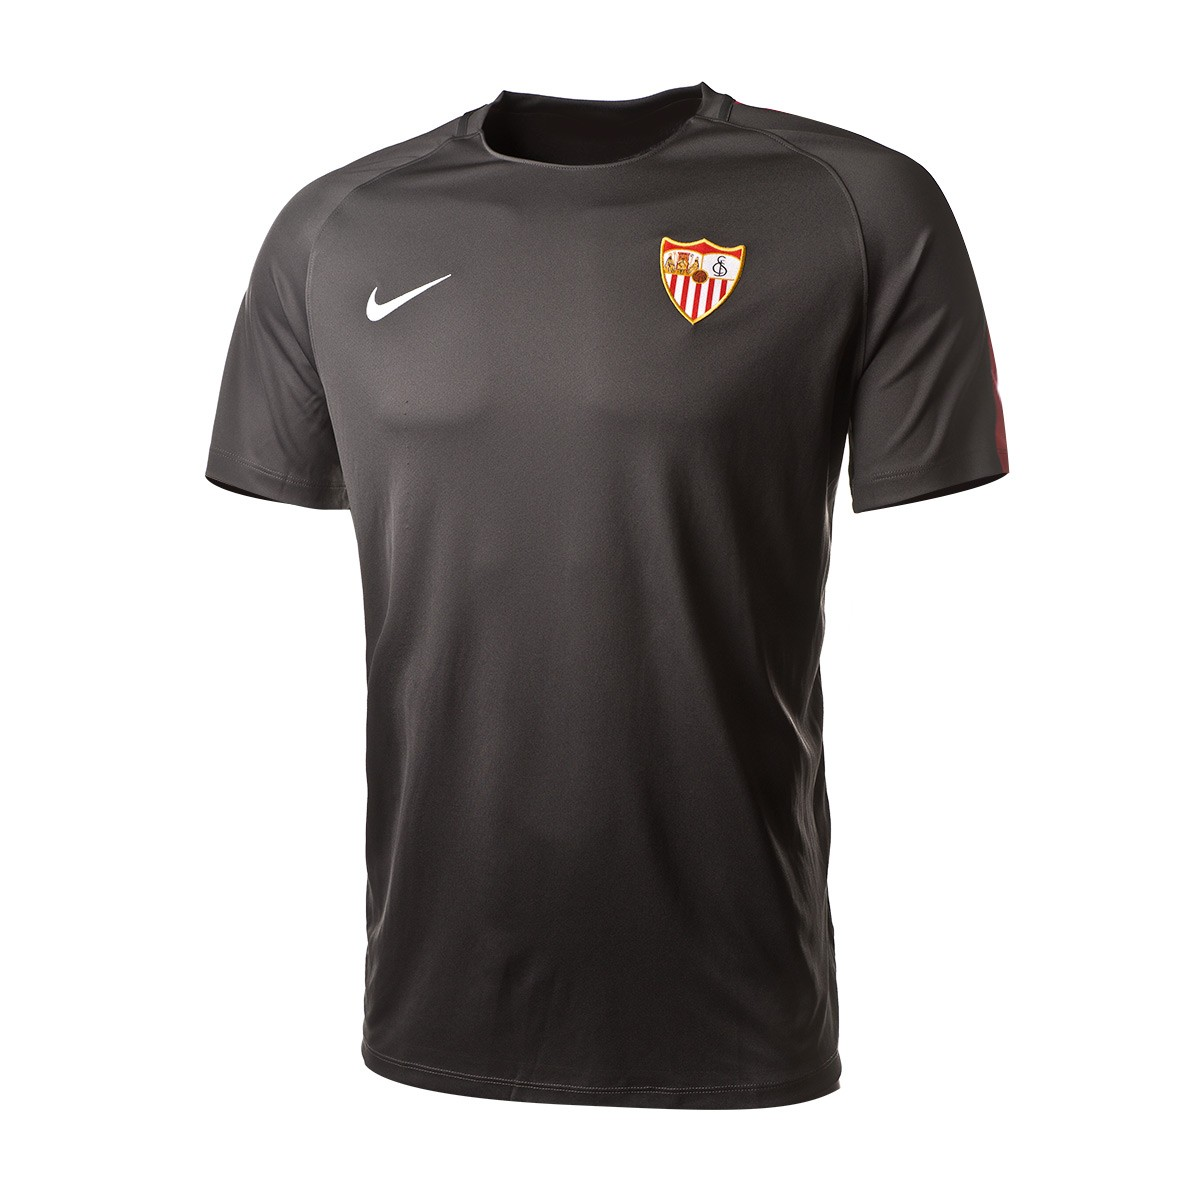 b0642d1659c5f Jersey Nike Sevilla FC Training 2018-2019 Grey - Tienda de fútbol Fútbol  Emotion